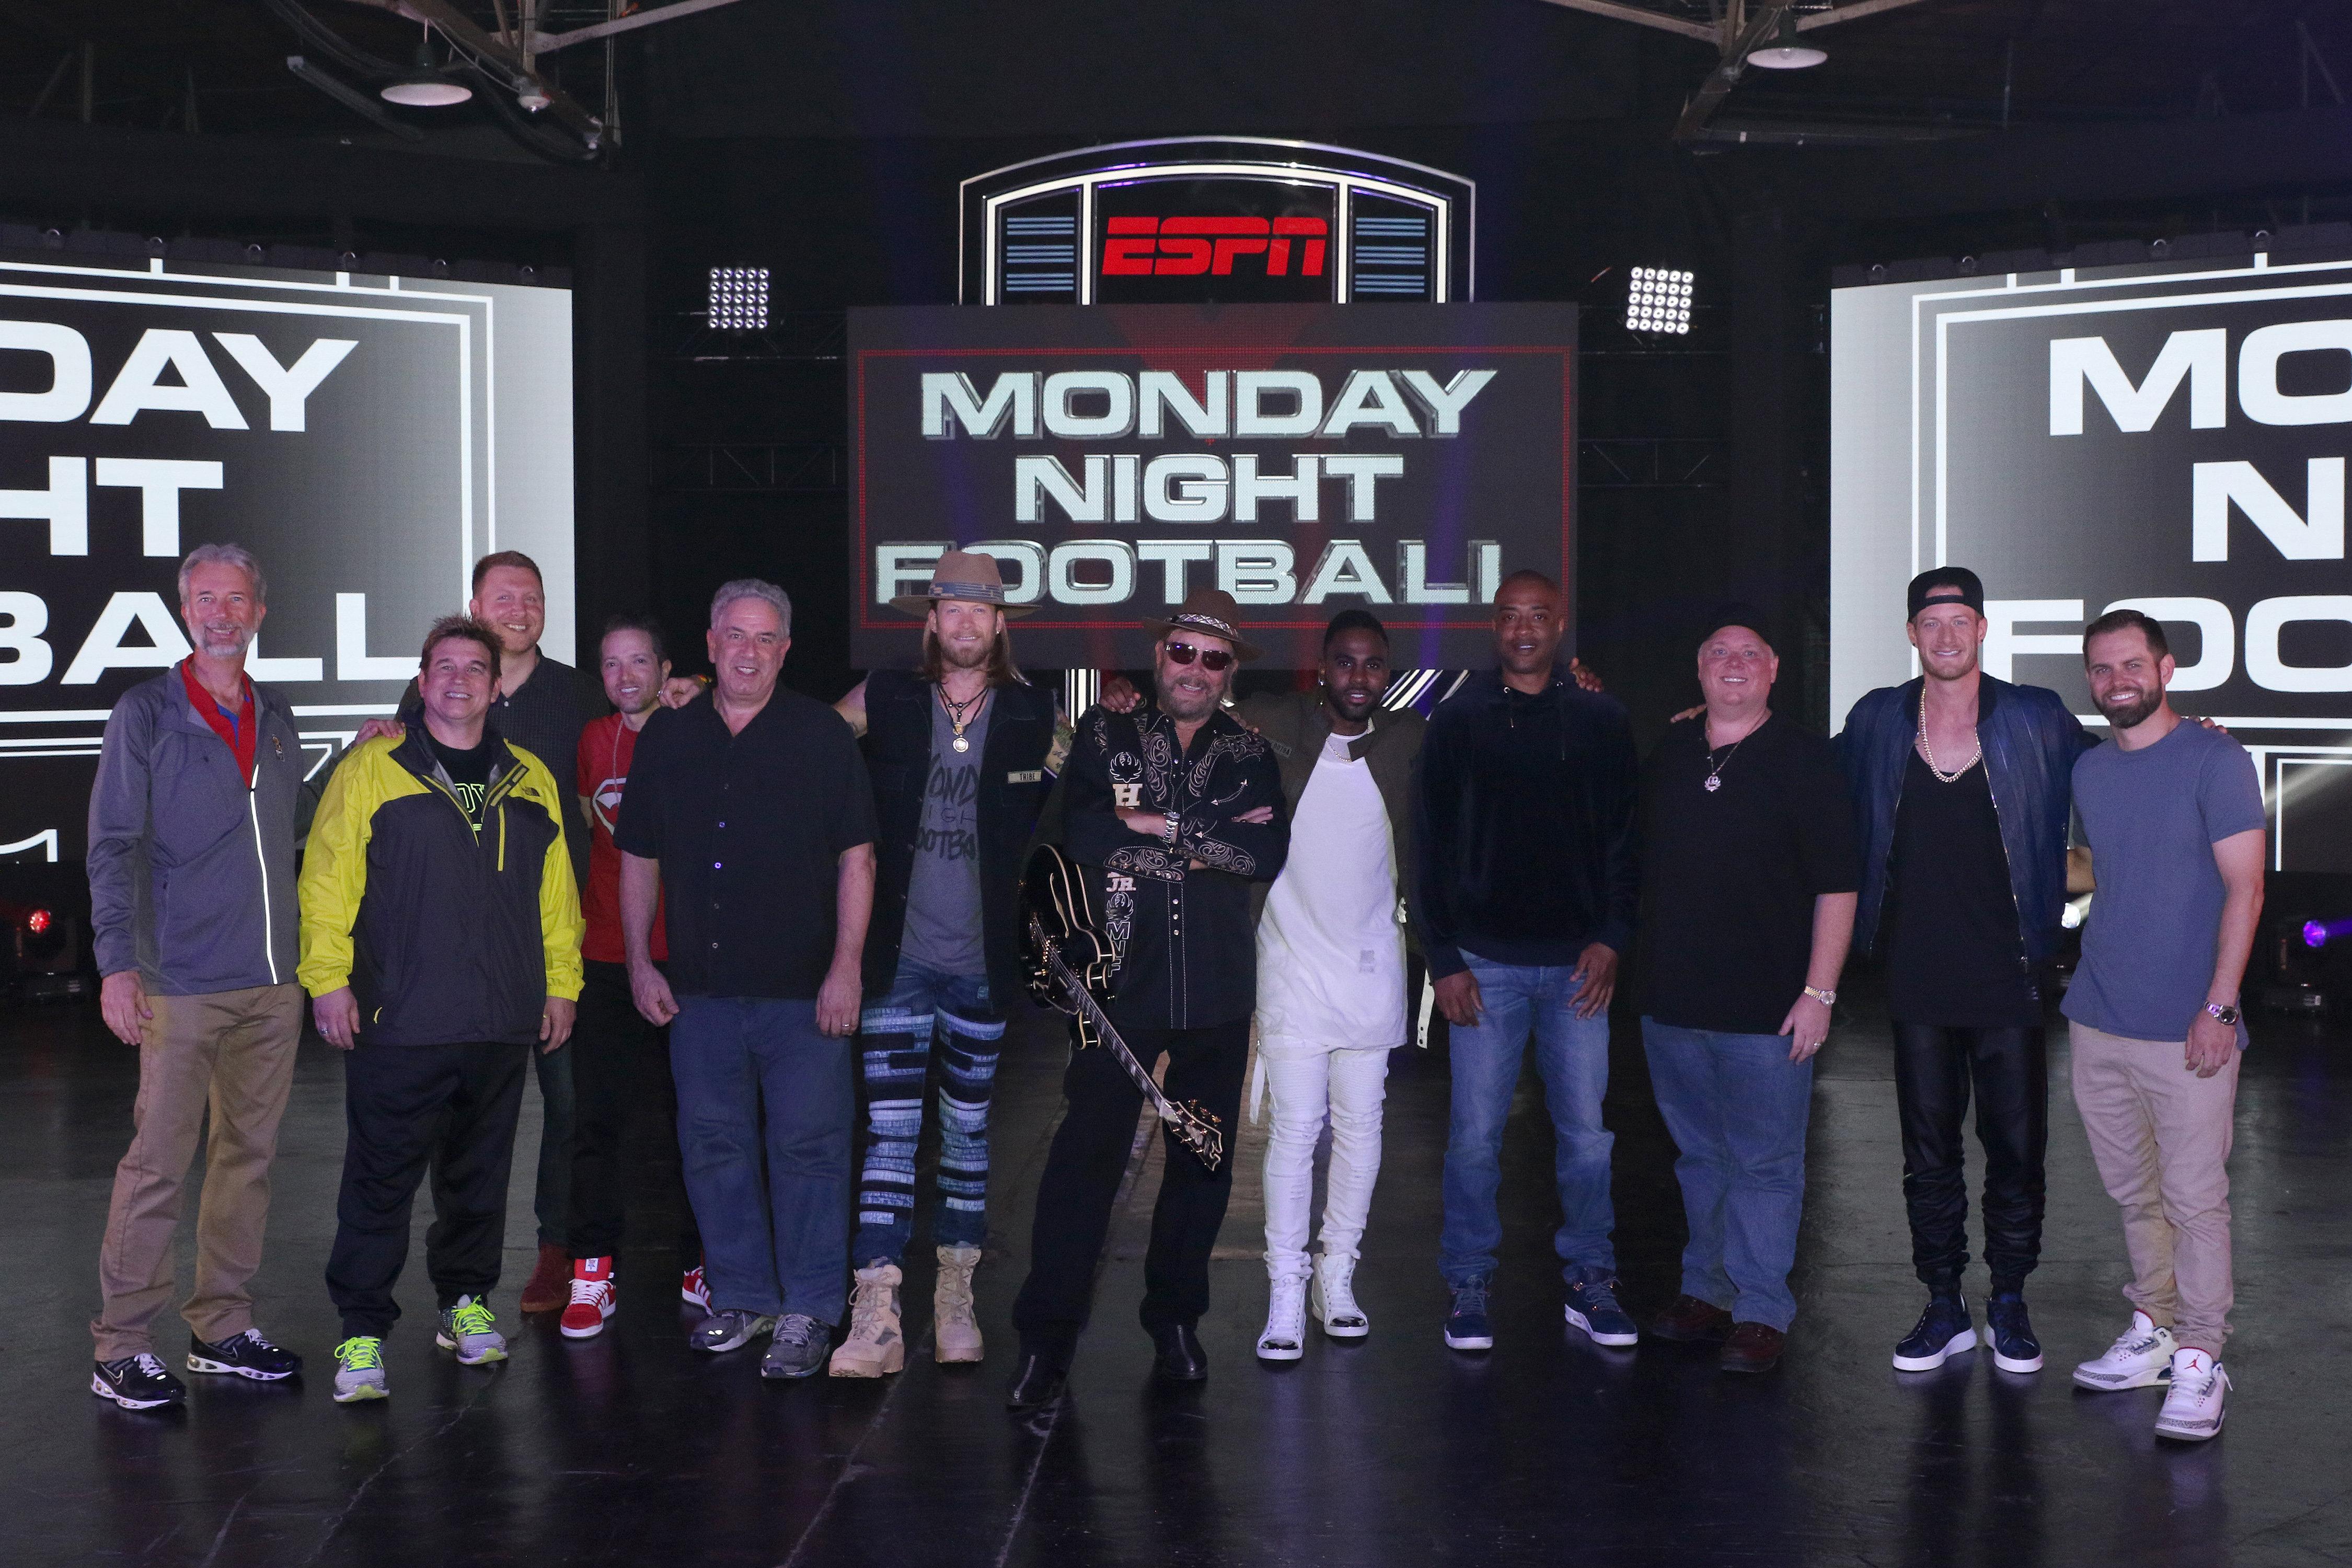 Florida Georgia Line, Jason Derulo to Join Hank Williams Jr. on Monday Night Football